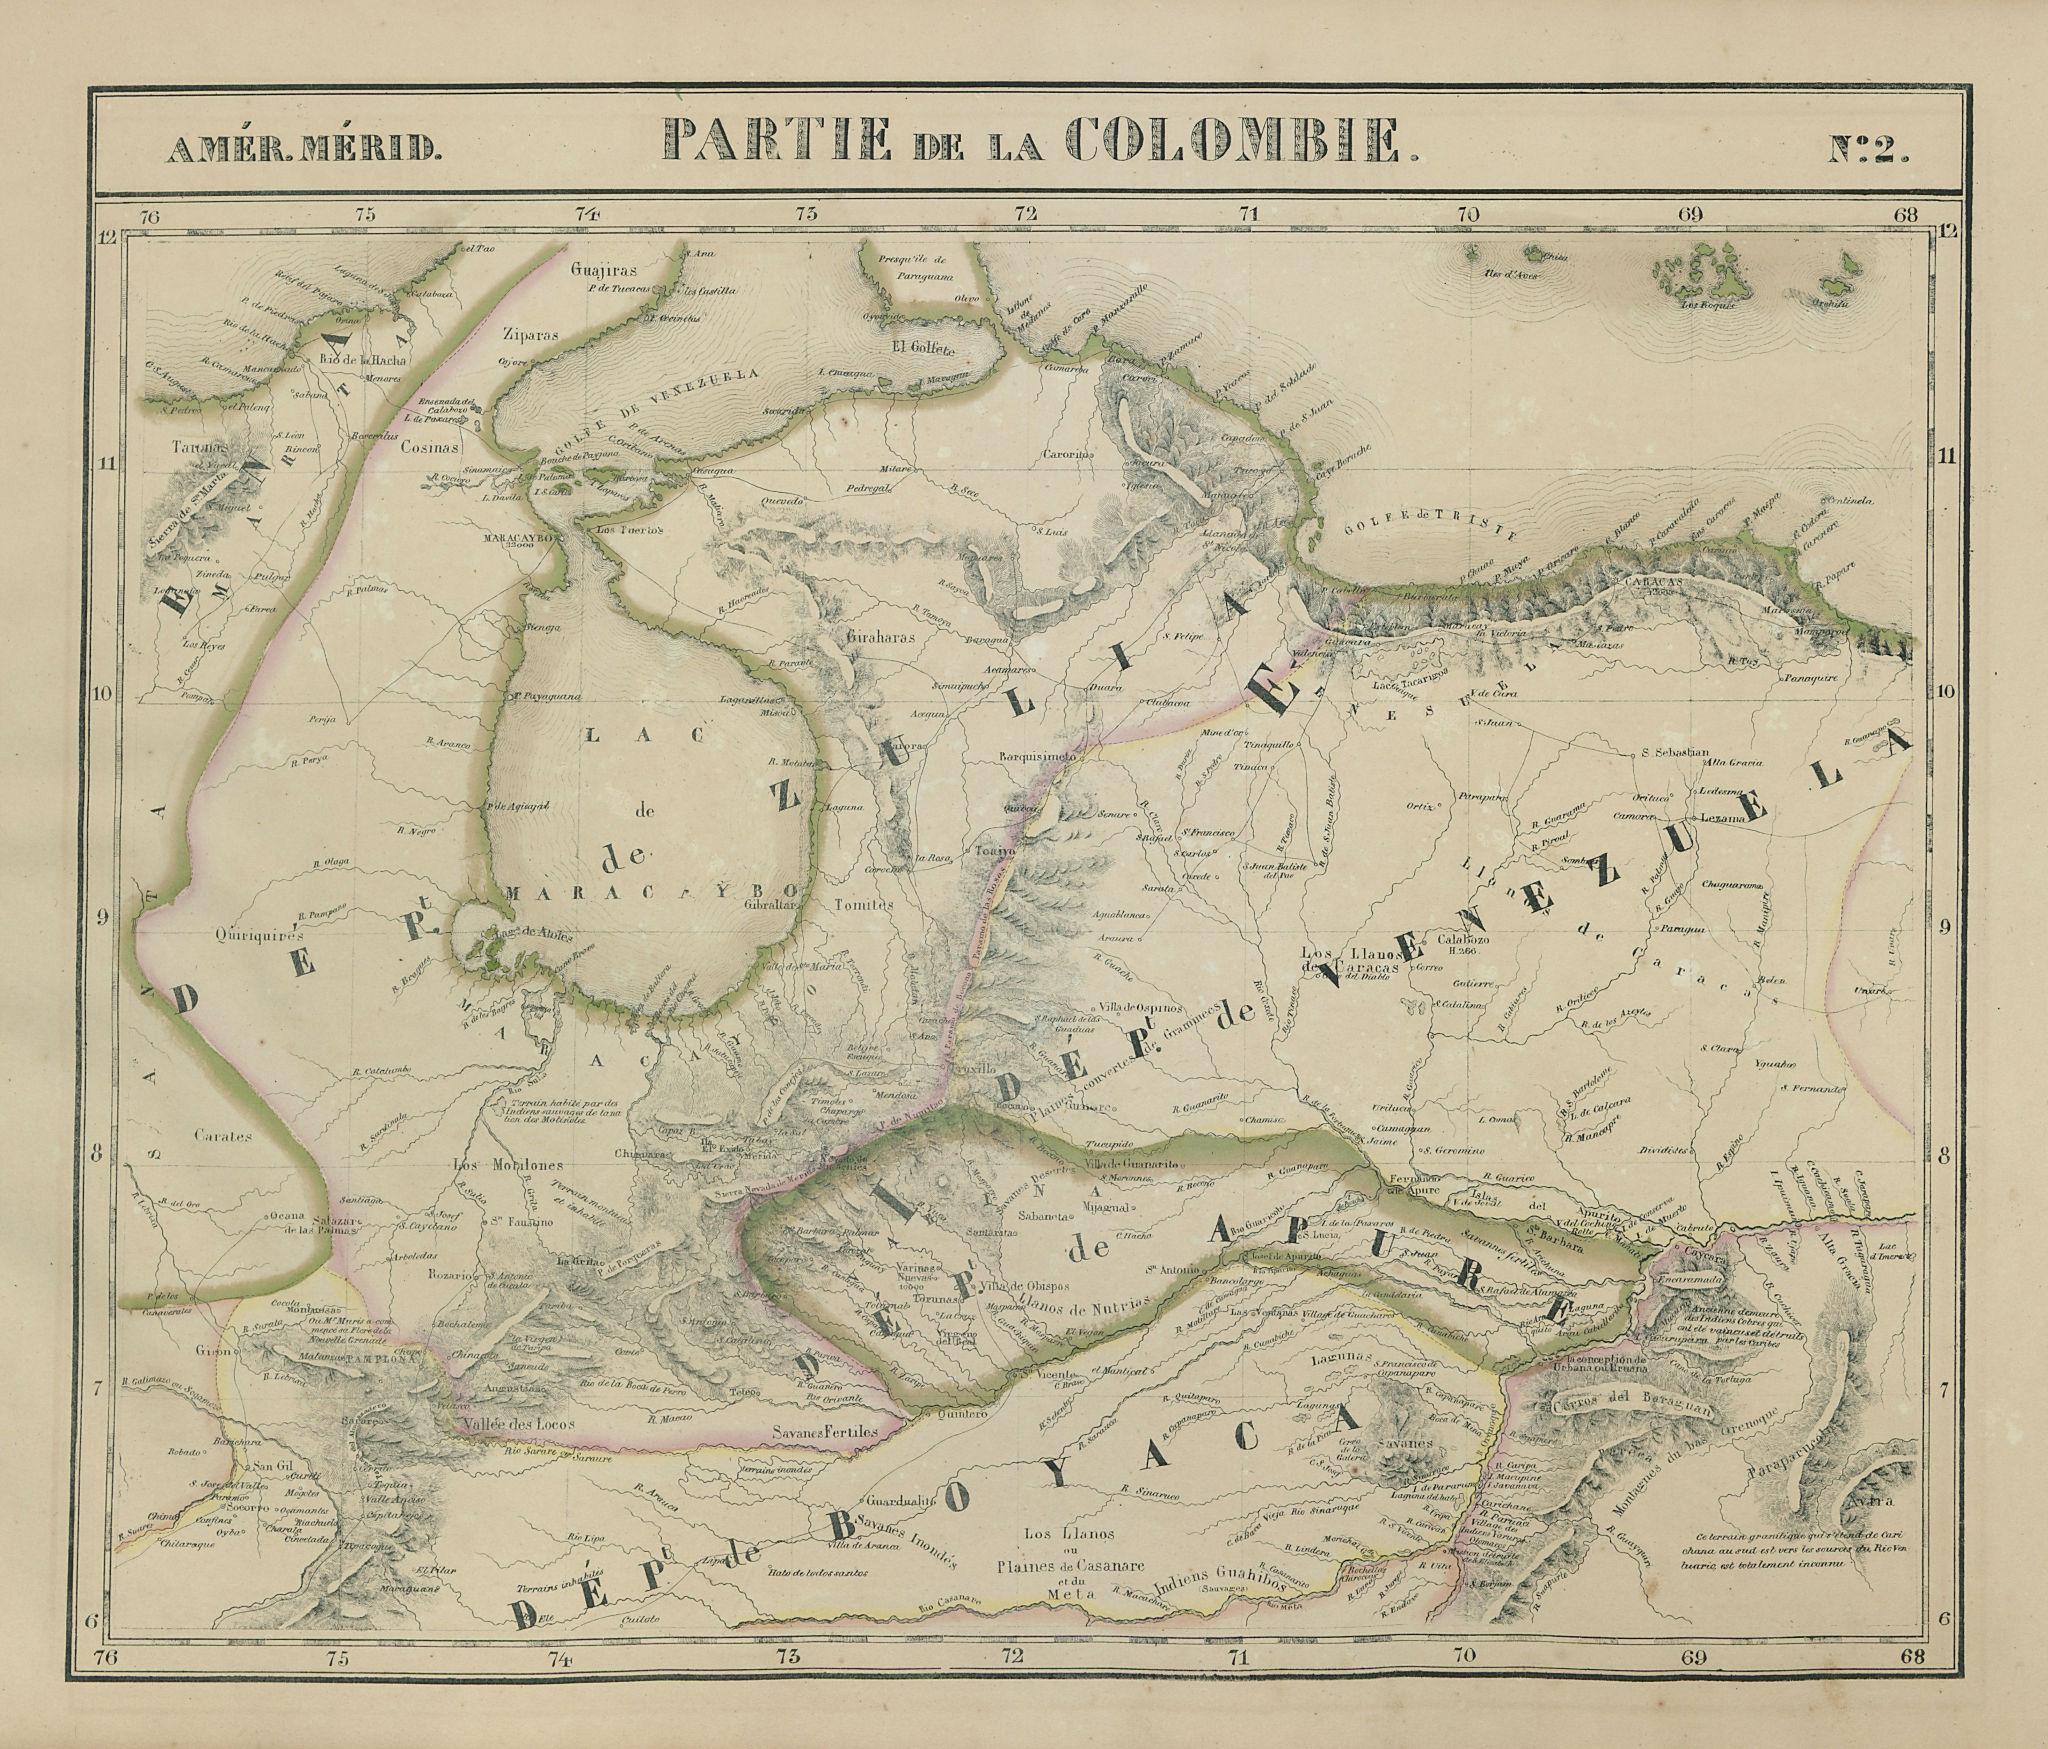 Amér. Mér. Colombie #2. Western Venezuela & NE Colombia. VANDERMAELEN 1827 map